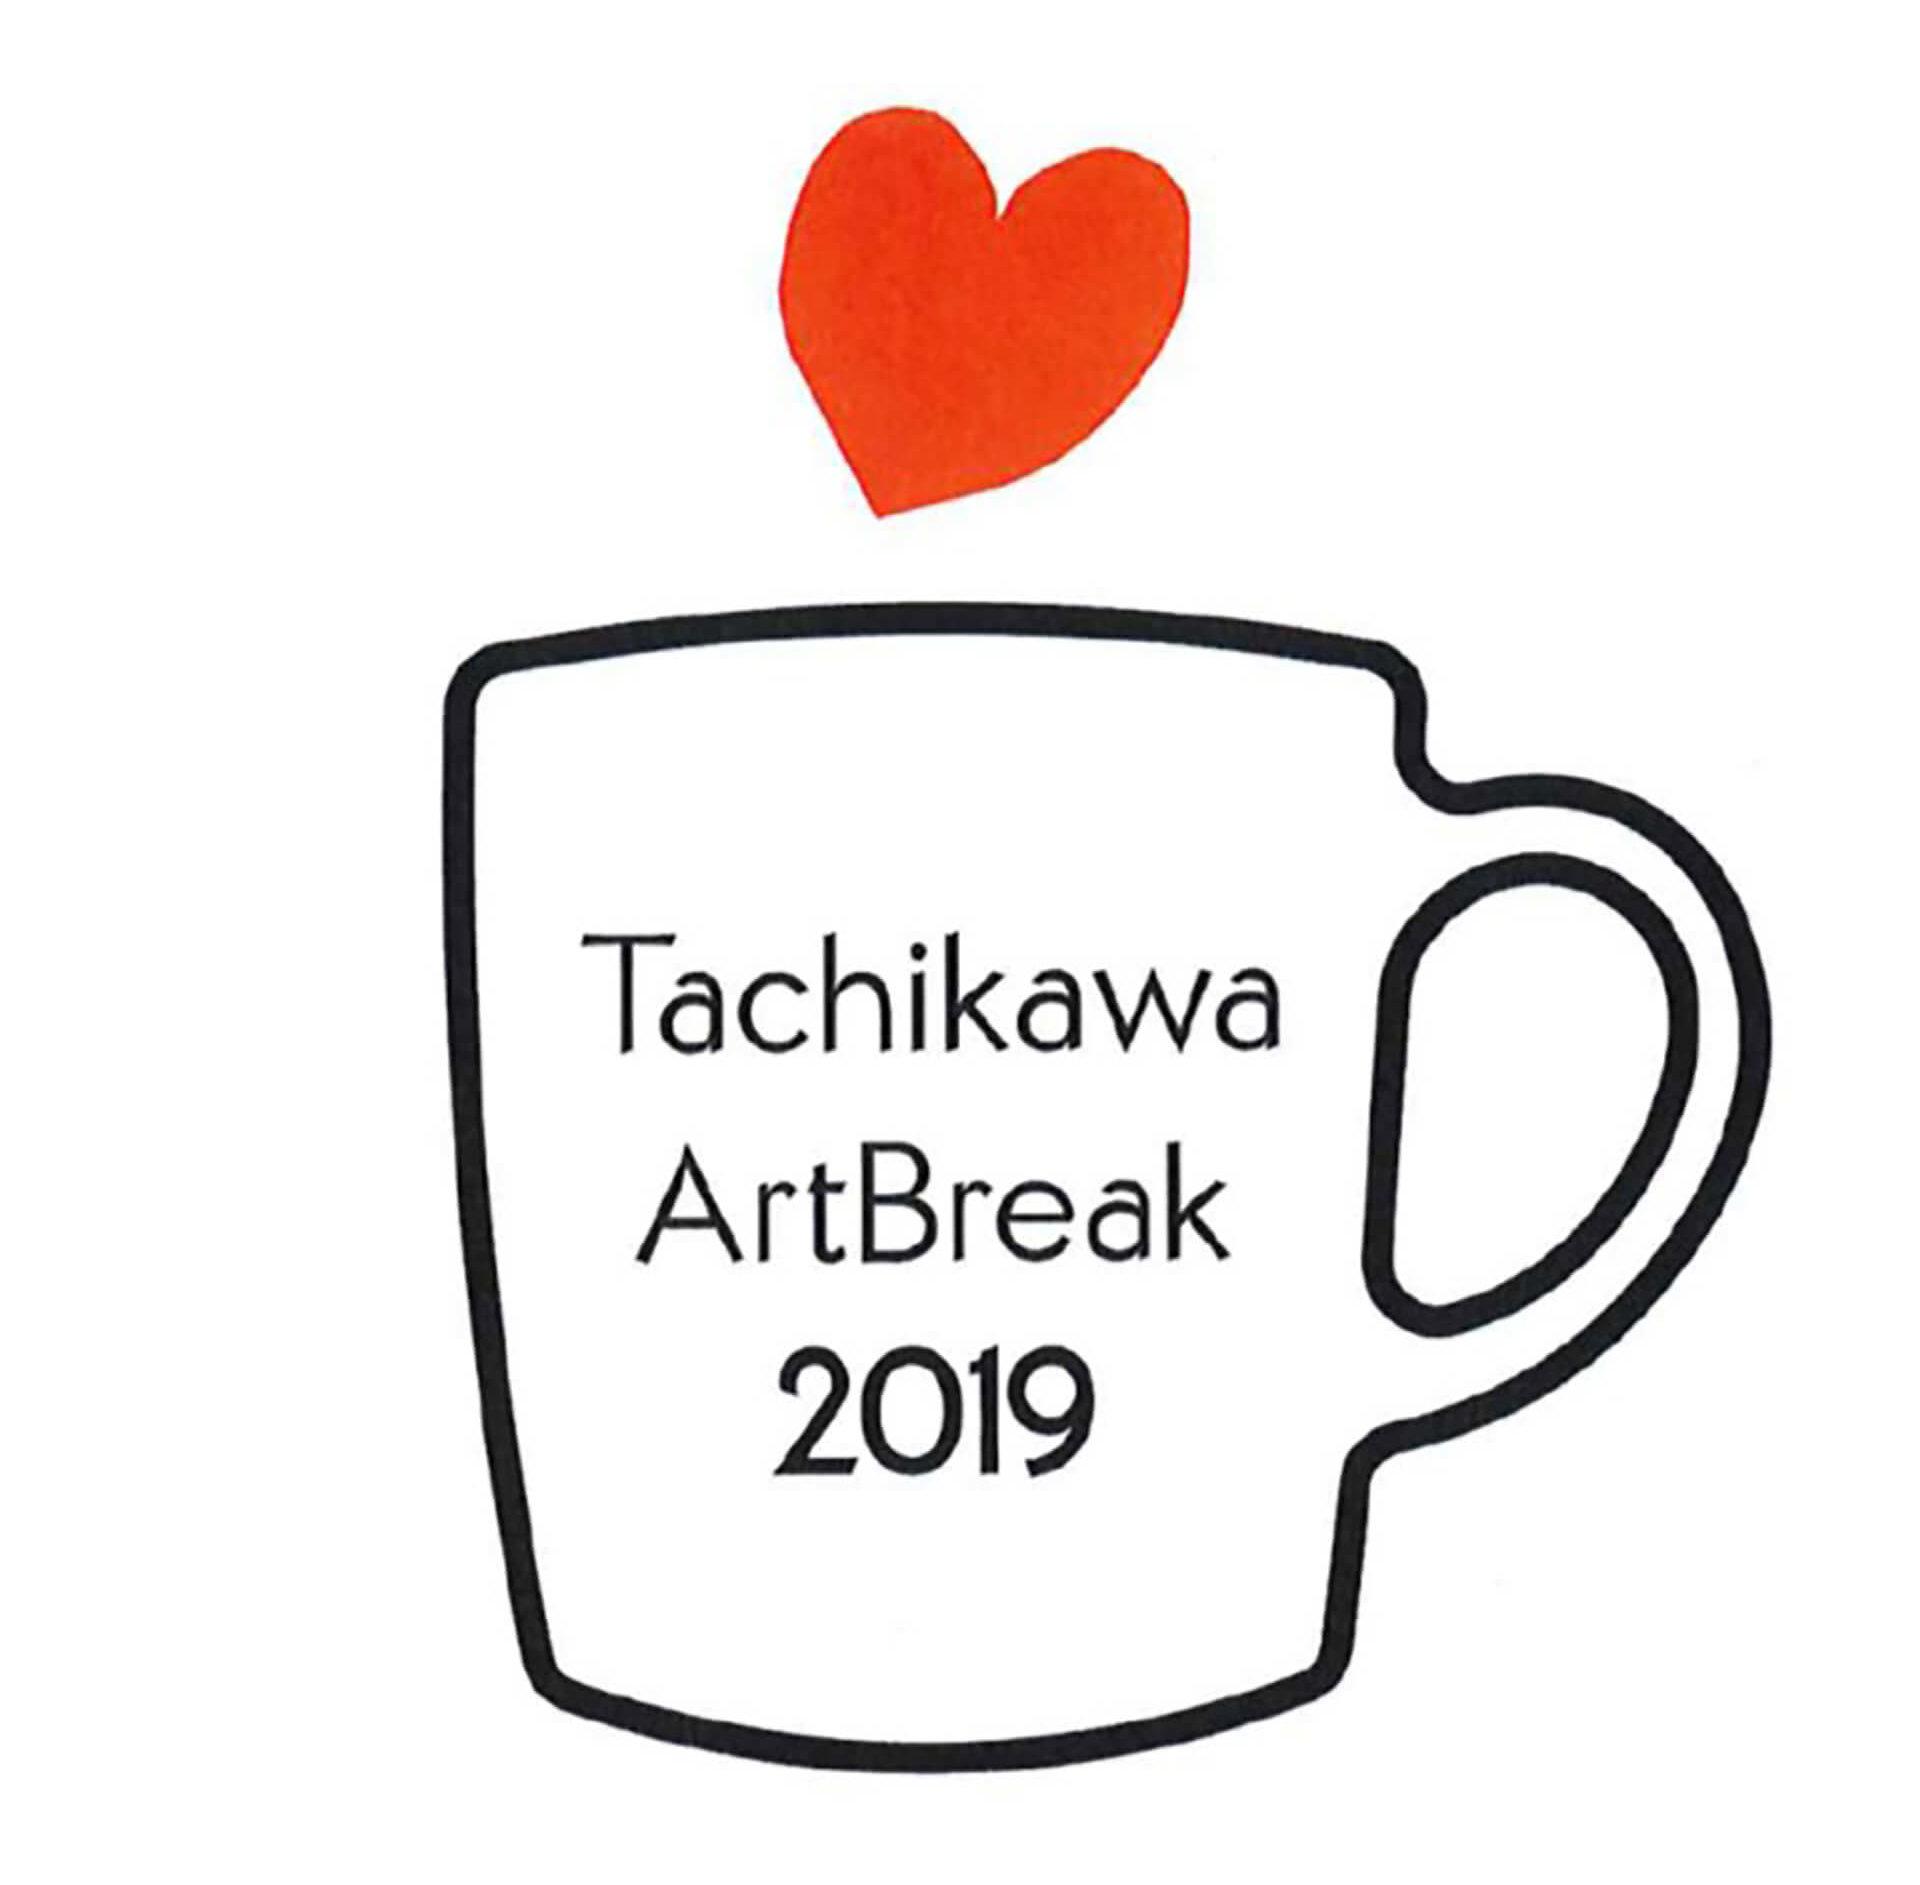 Tachikawa ArtBreak 2019バナー